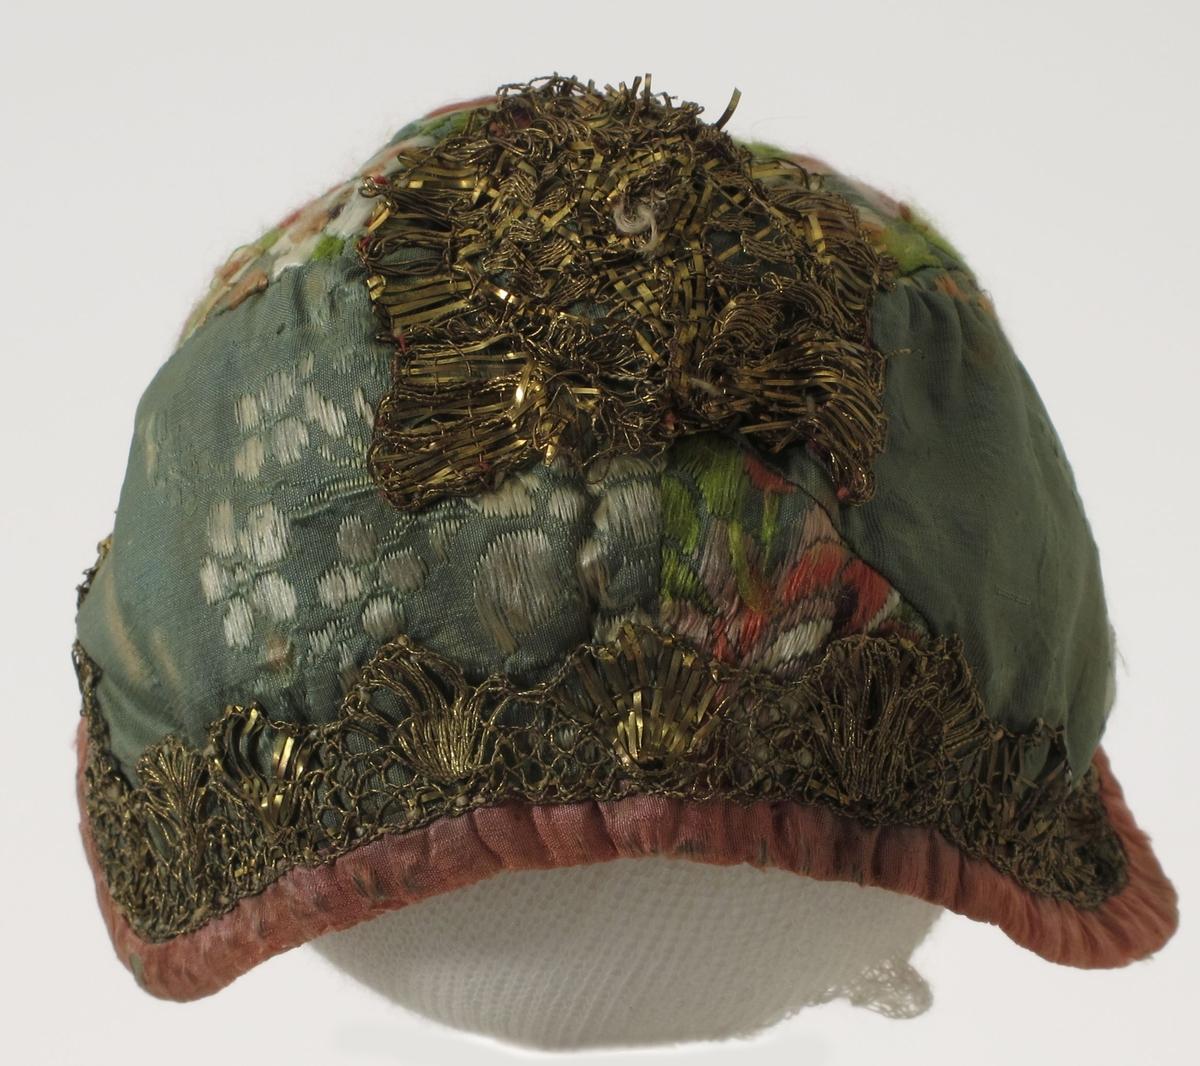 Blomster/ blad./ skjoldformet ornament